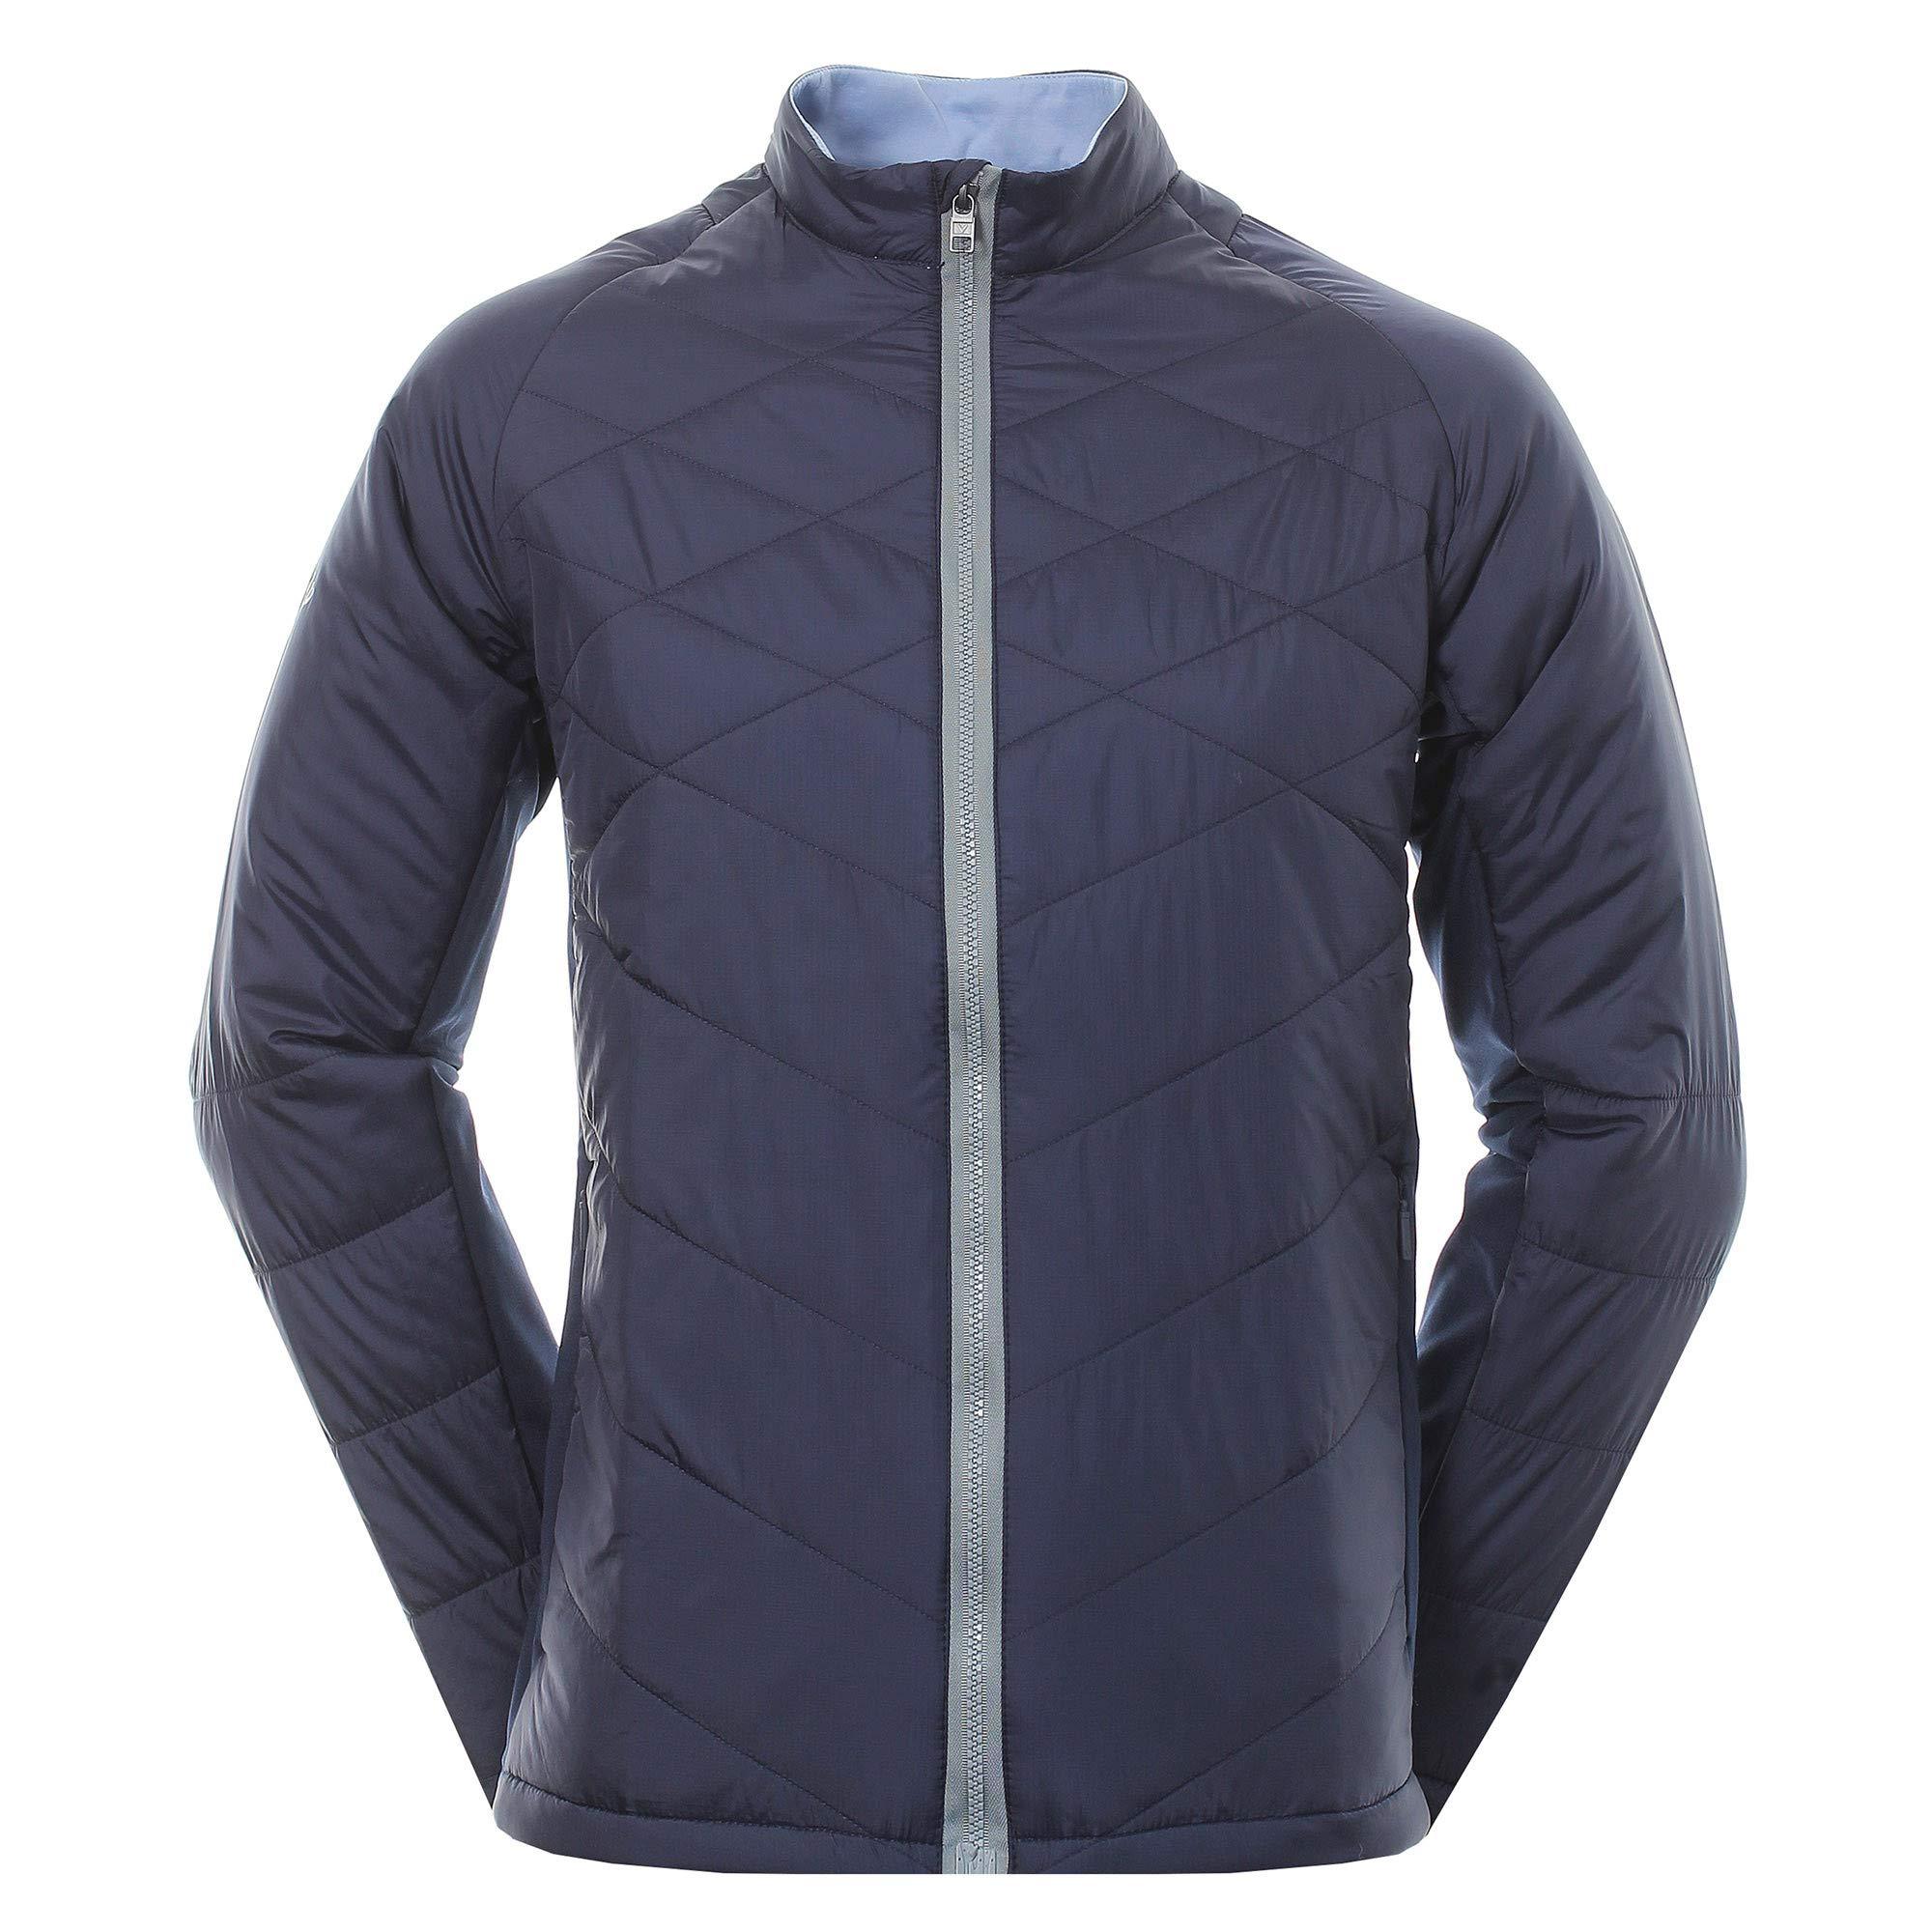 Callaway Golf 2018 Mens Full Zip Chev Thermal Puffer Jacket Peacoat Small by Callaway